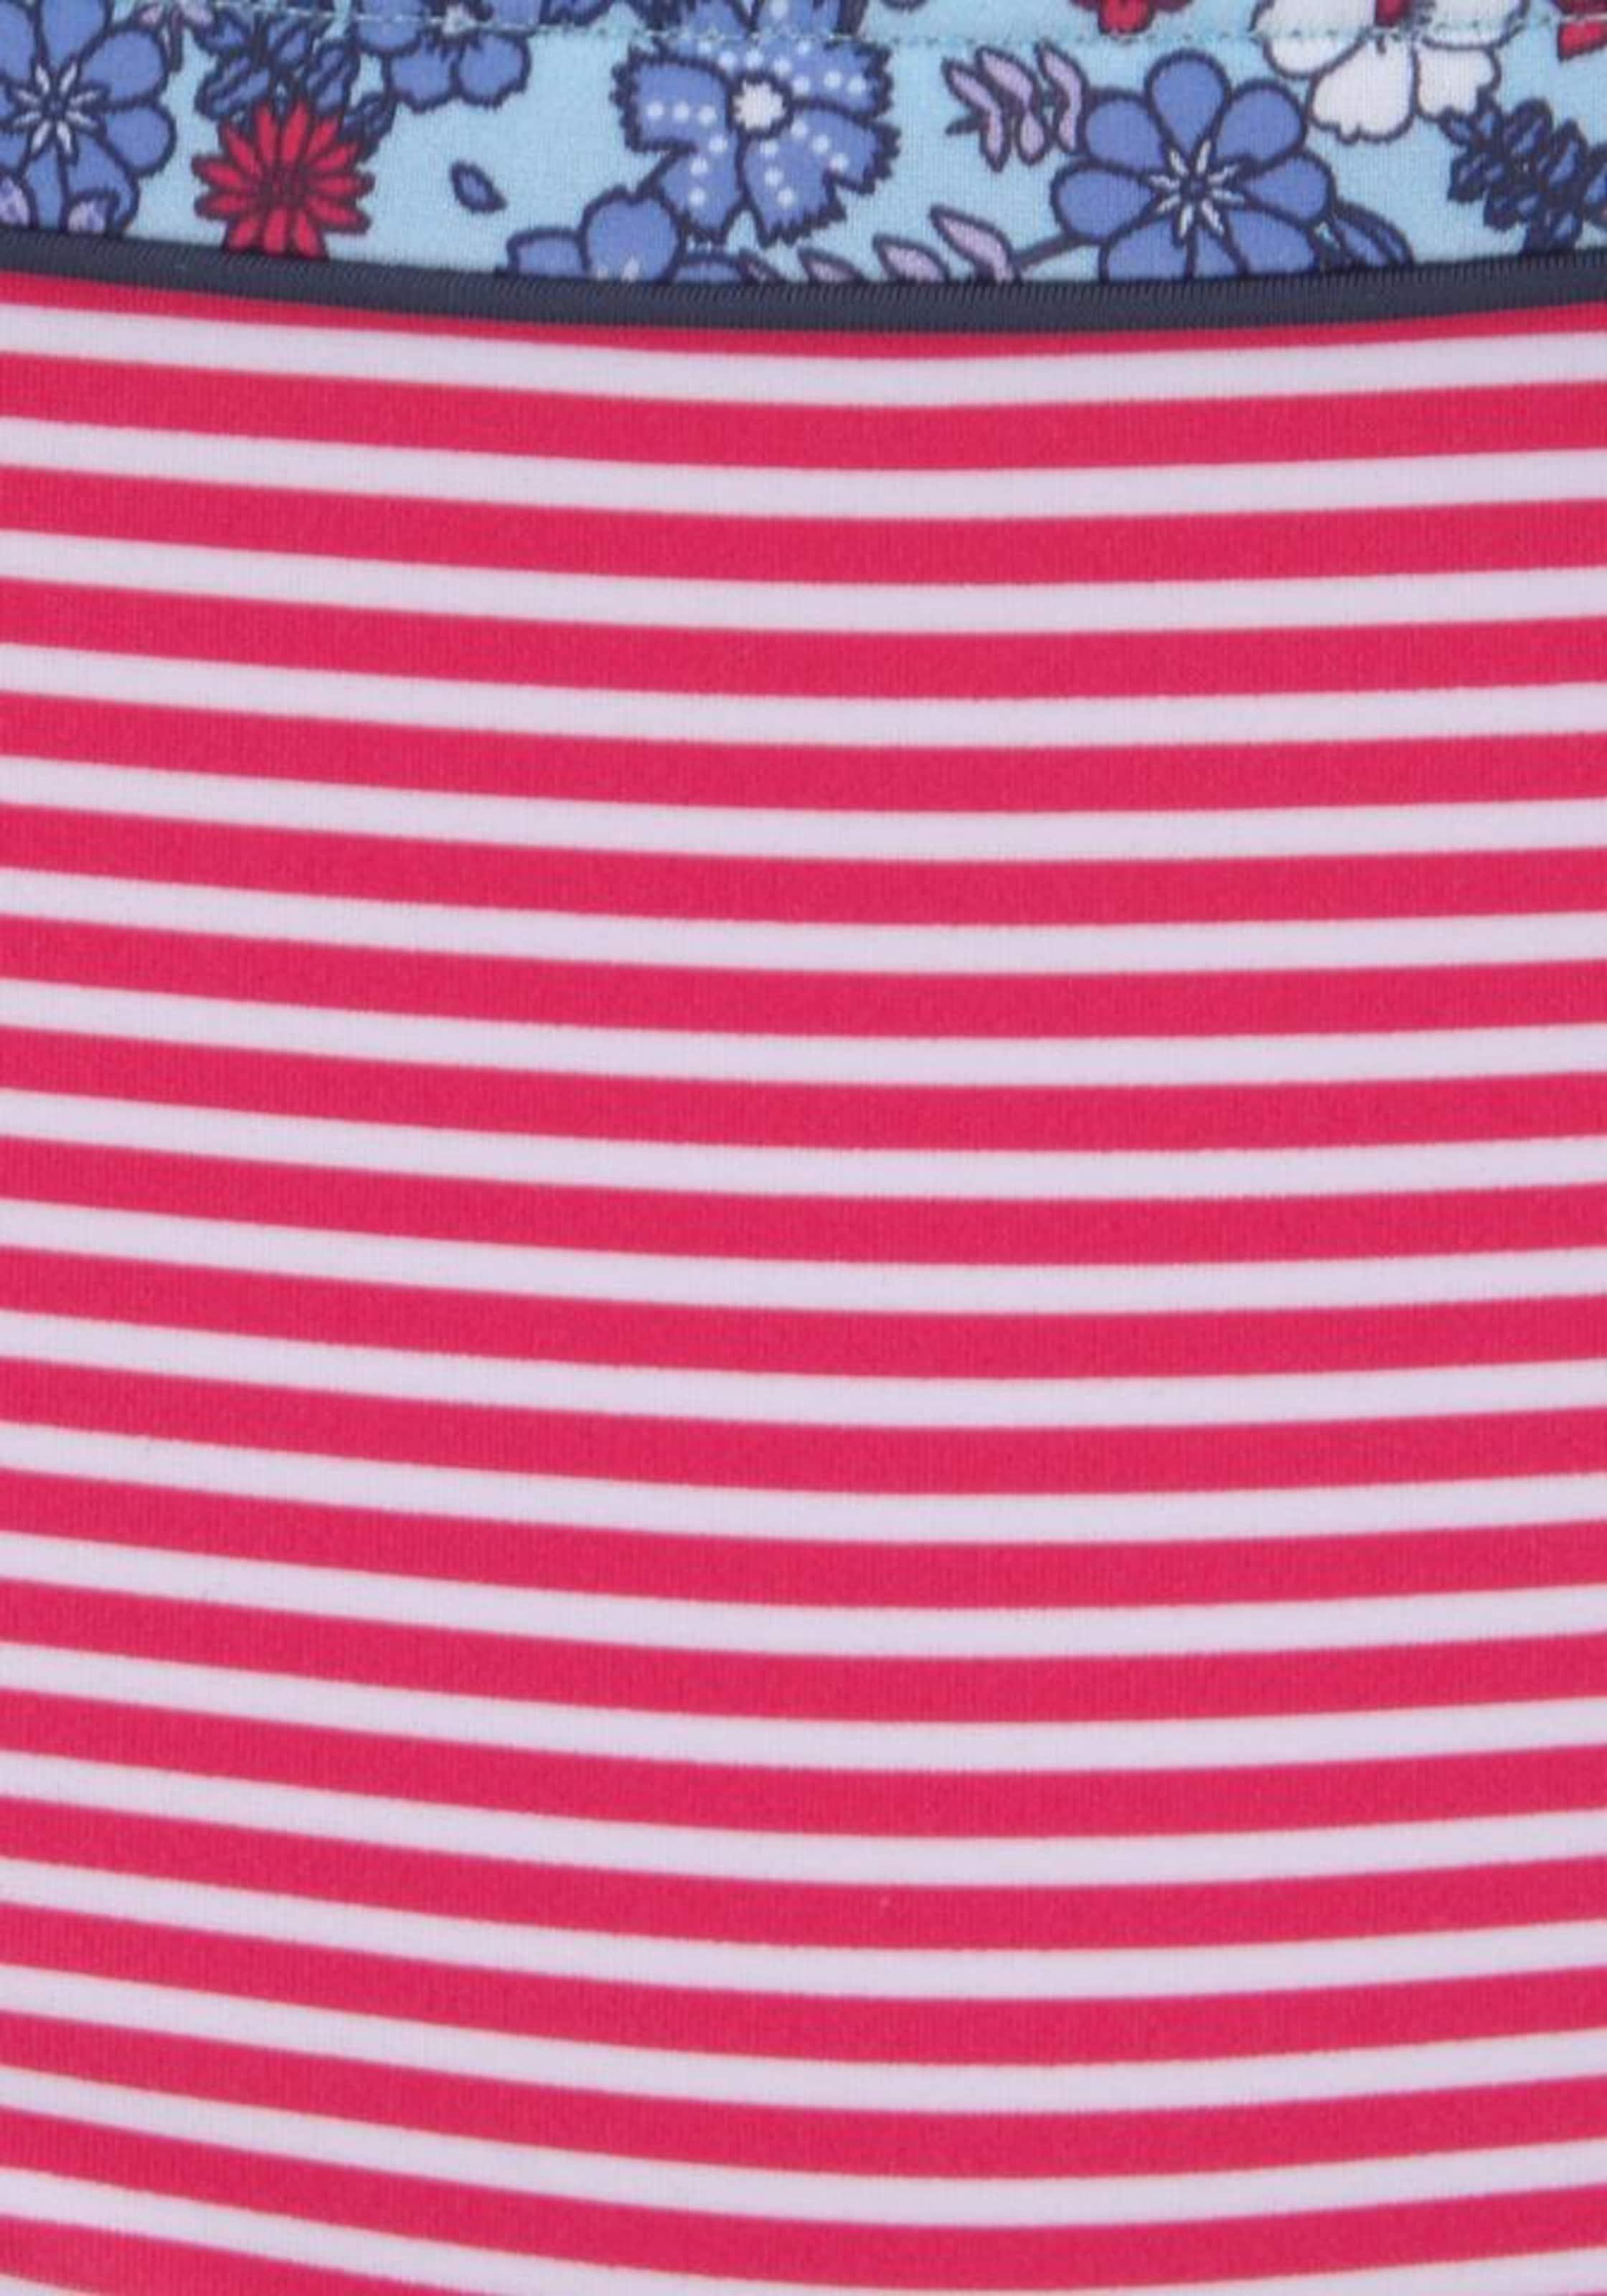 Label Beachwear hose oliver Red S BlauRot Bikini In Weiß KcTlF1J3